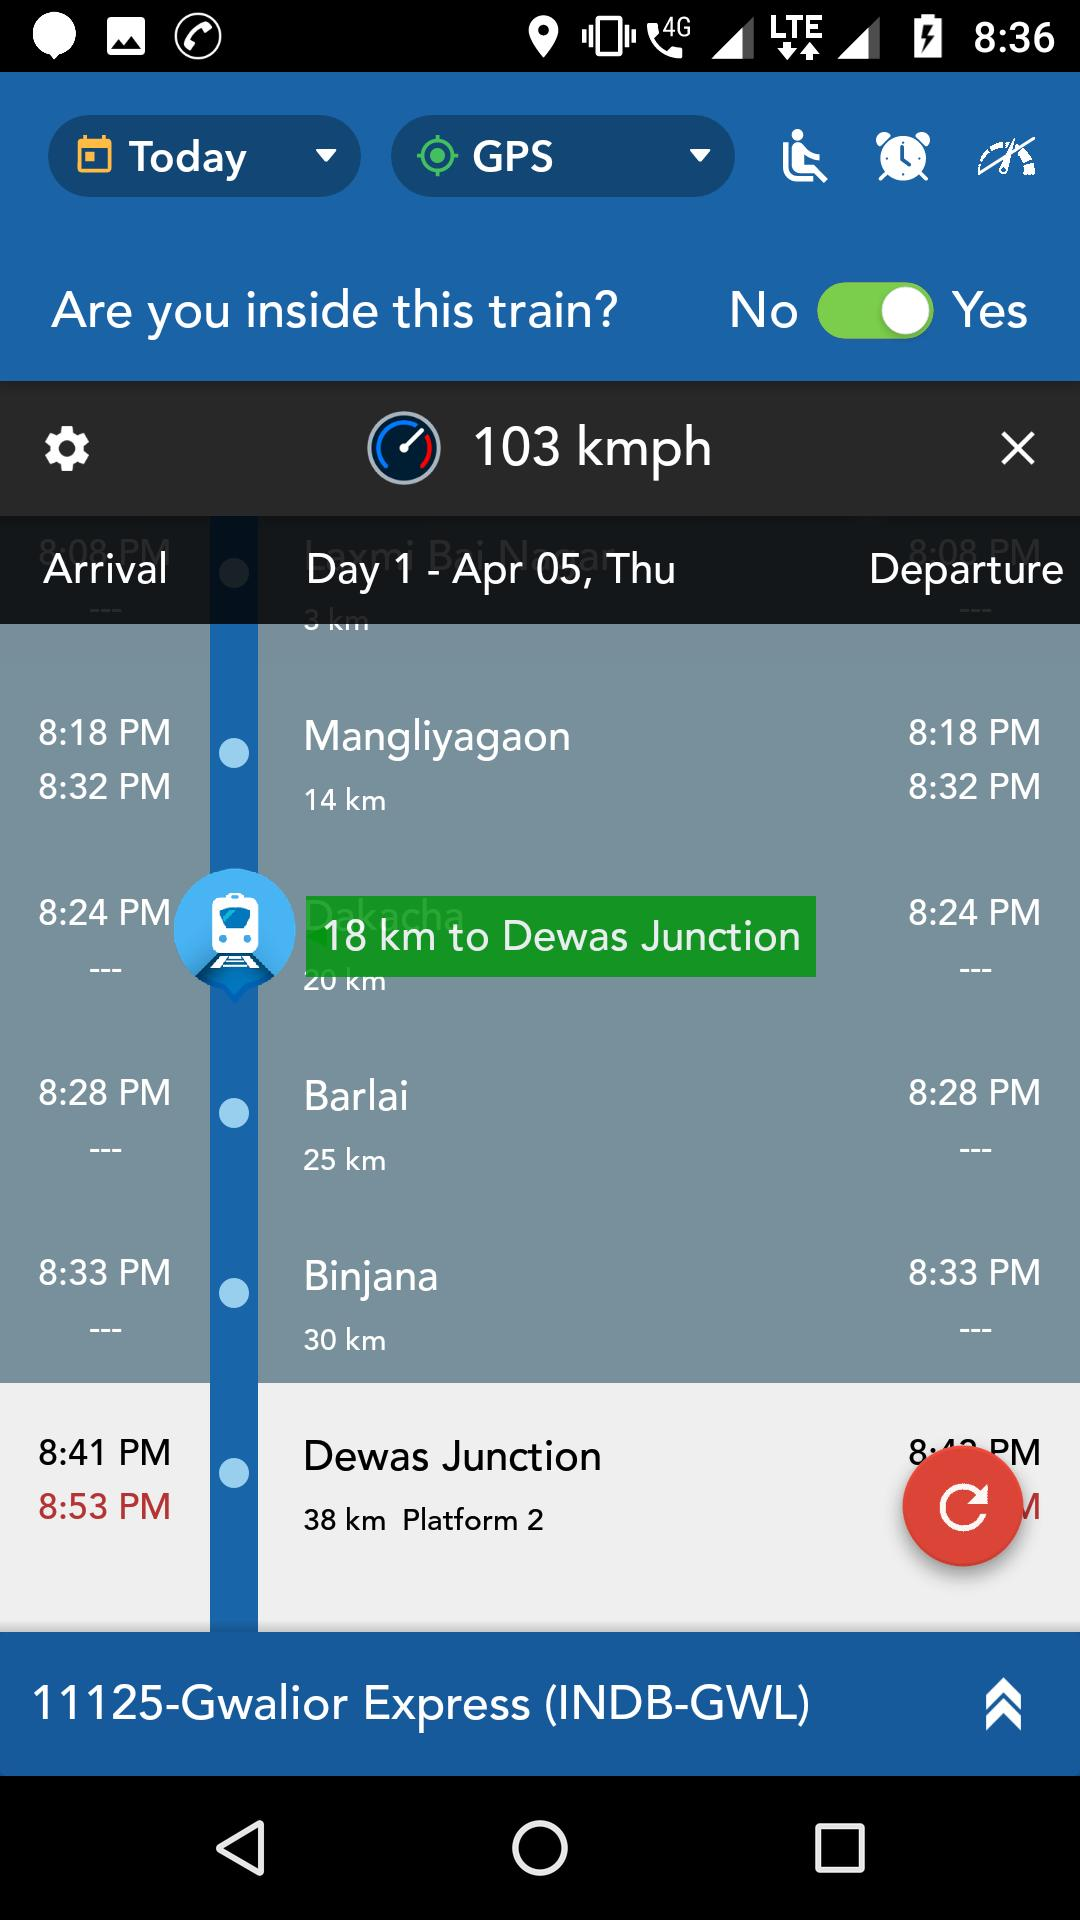 3273456-2: App name is - Where is my train if u r i